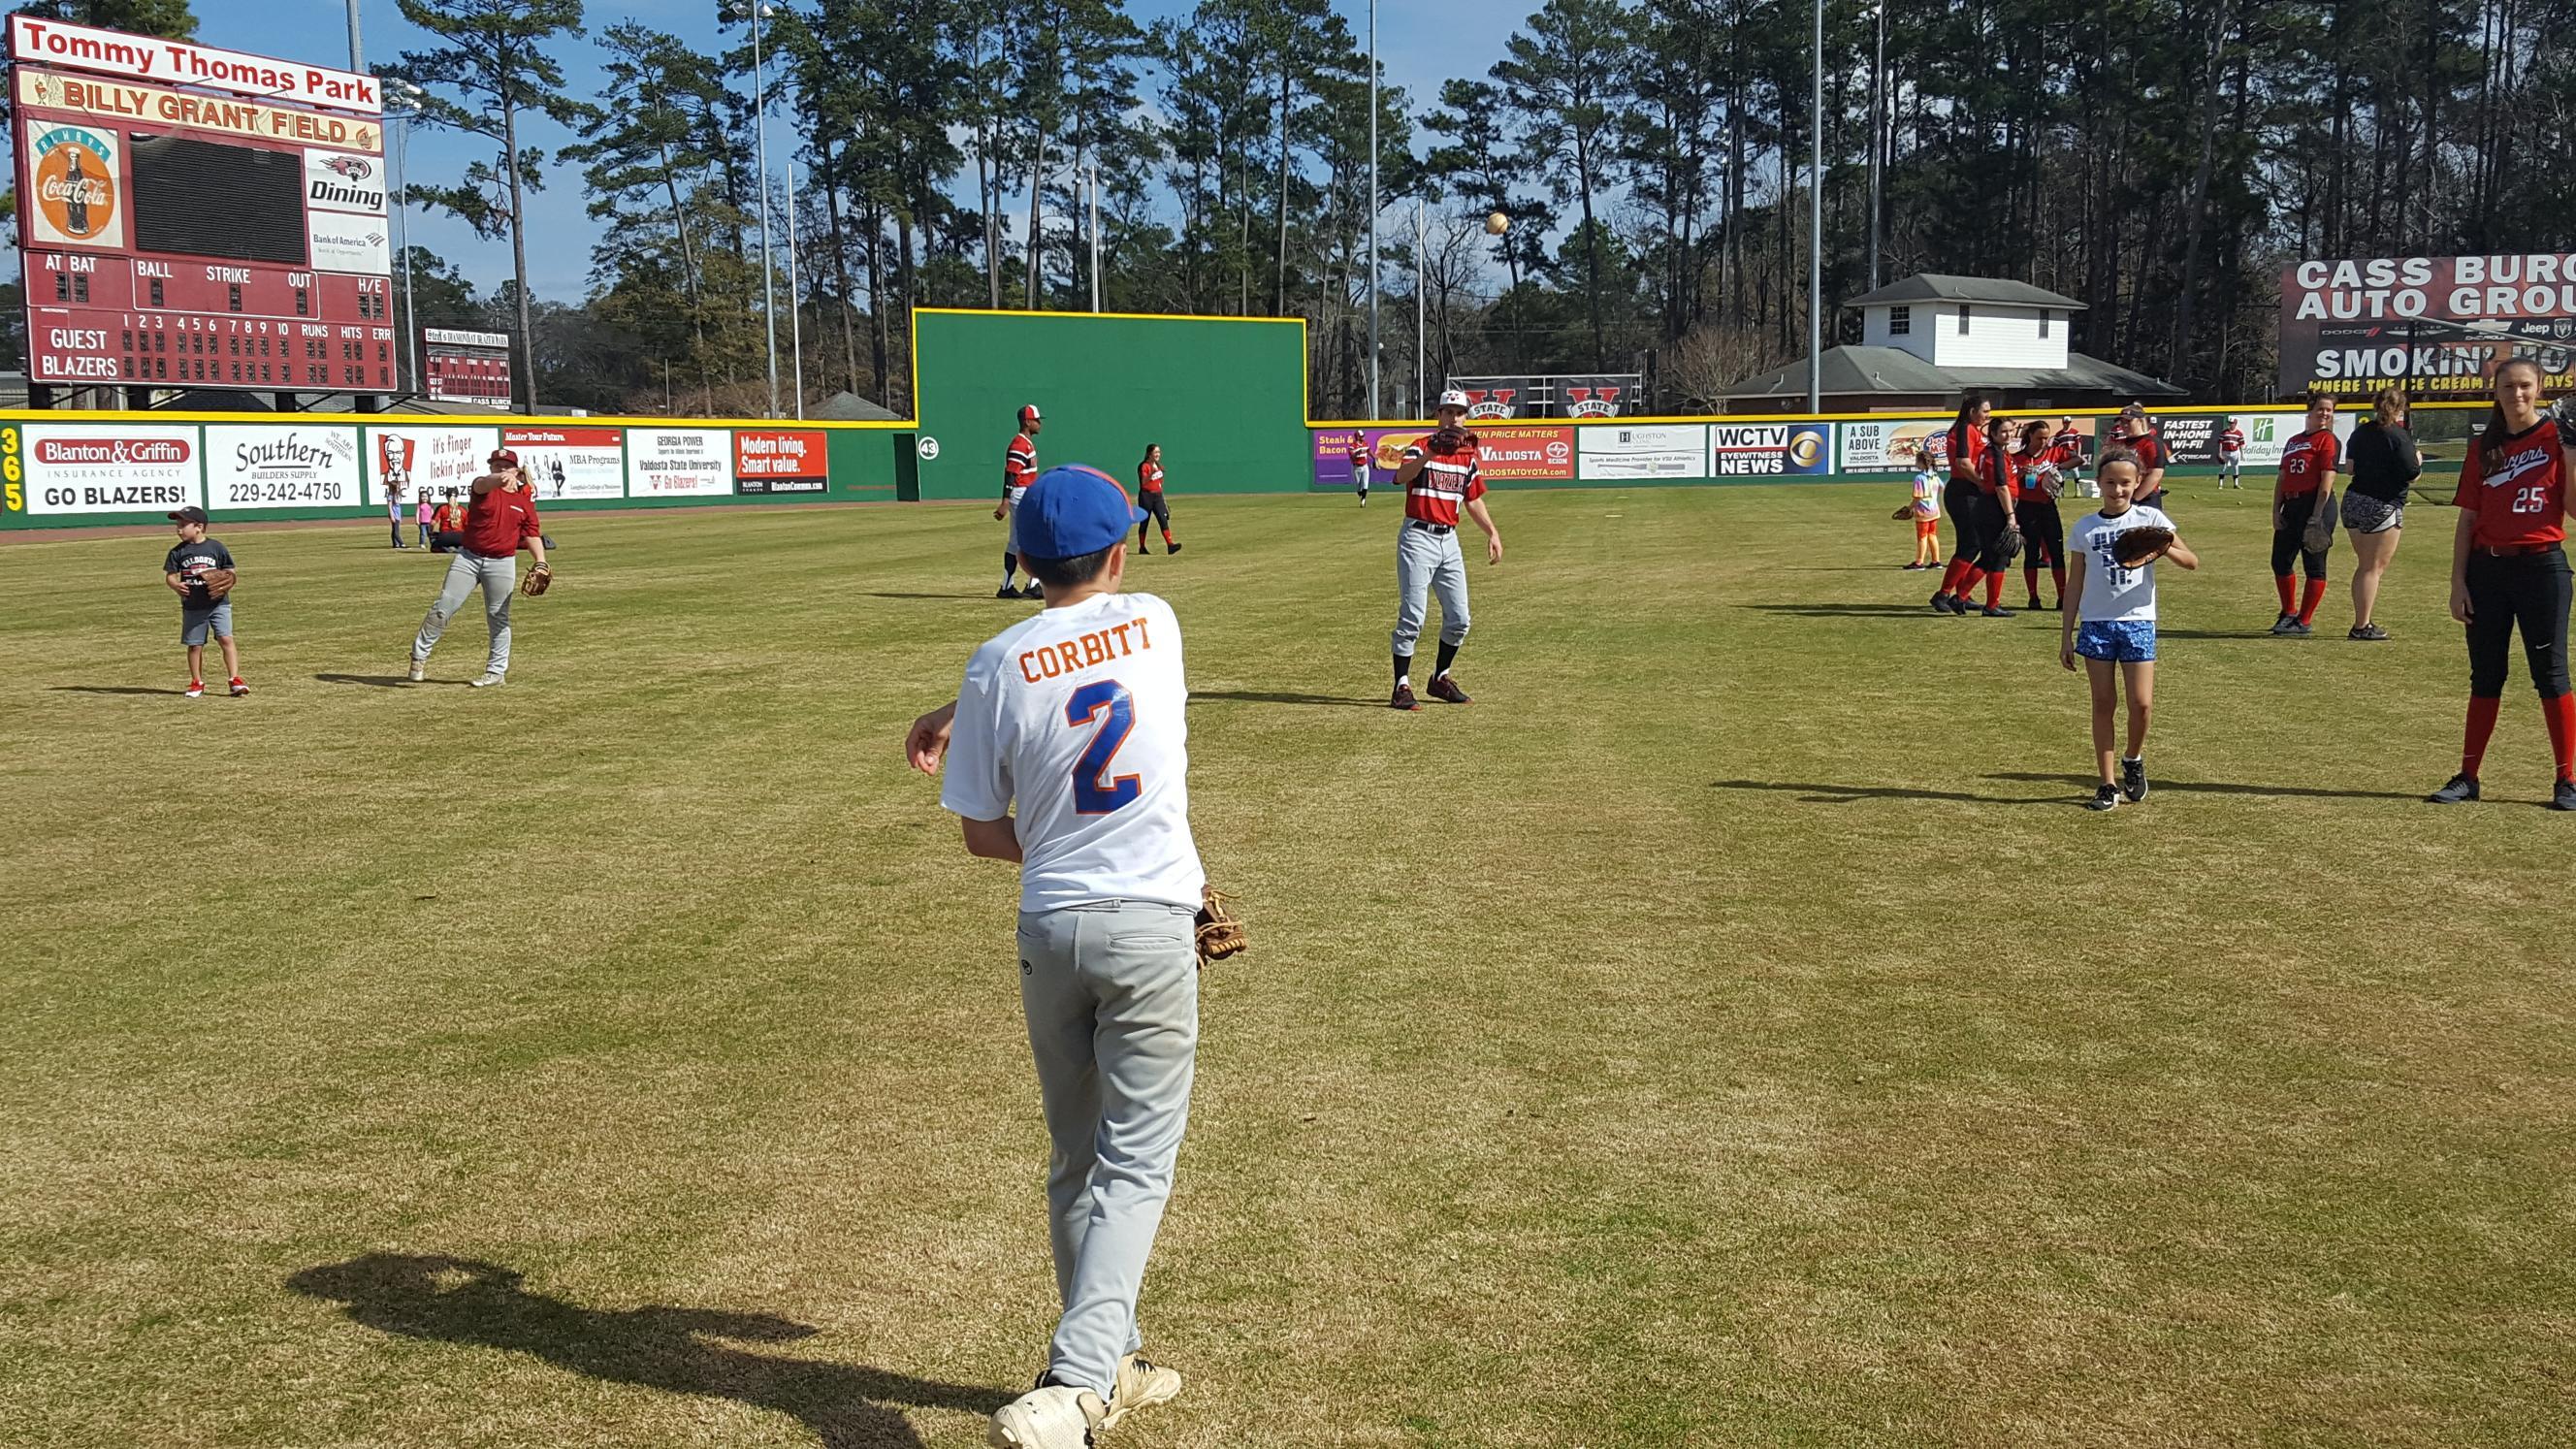 corbitt playing catch